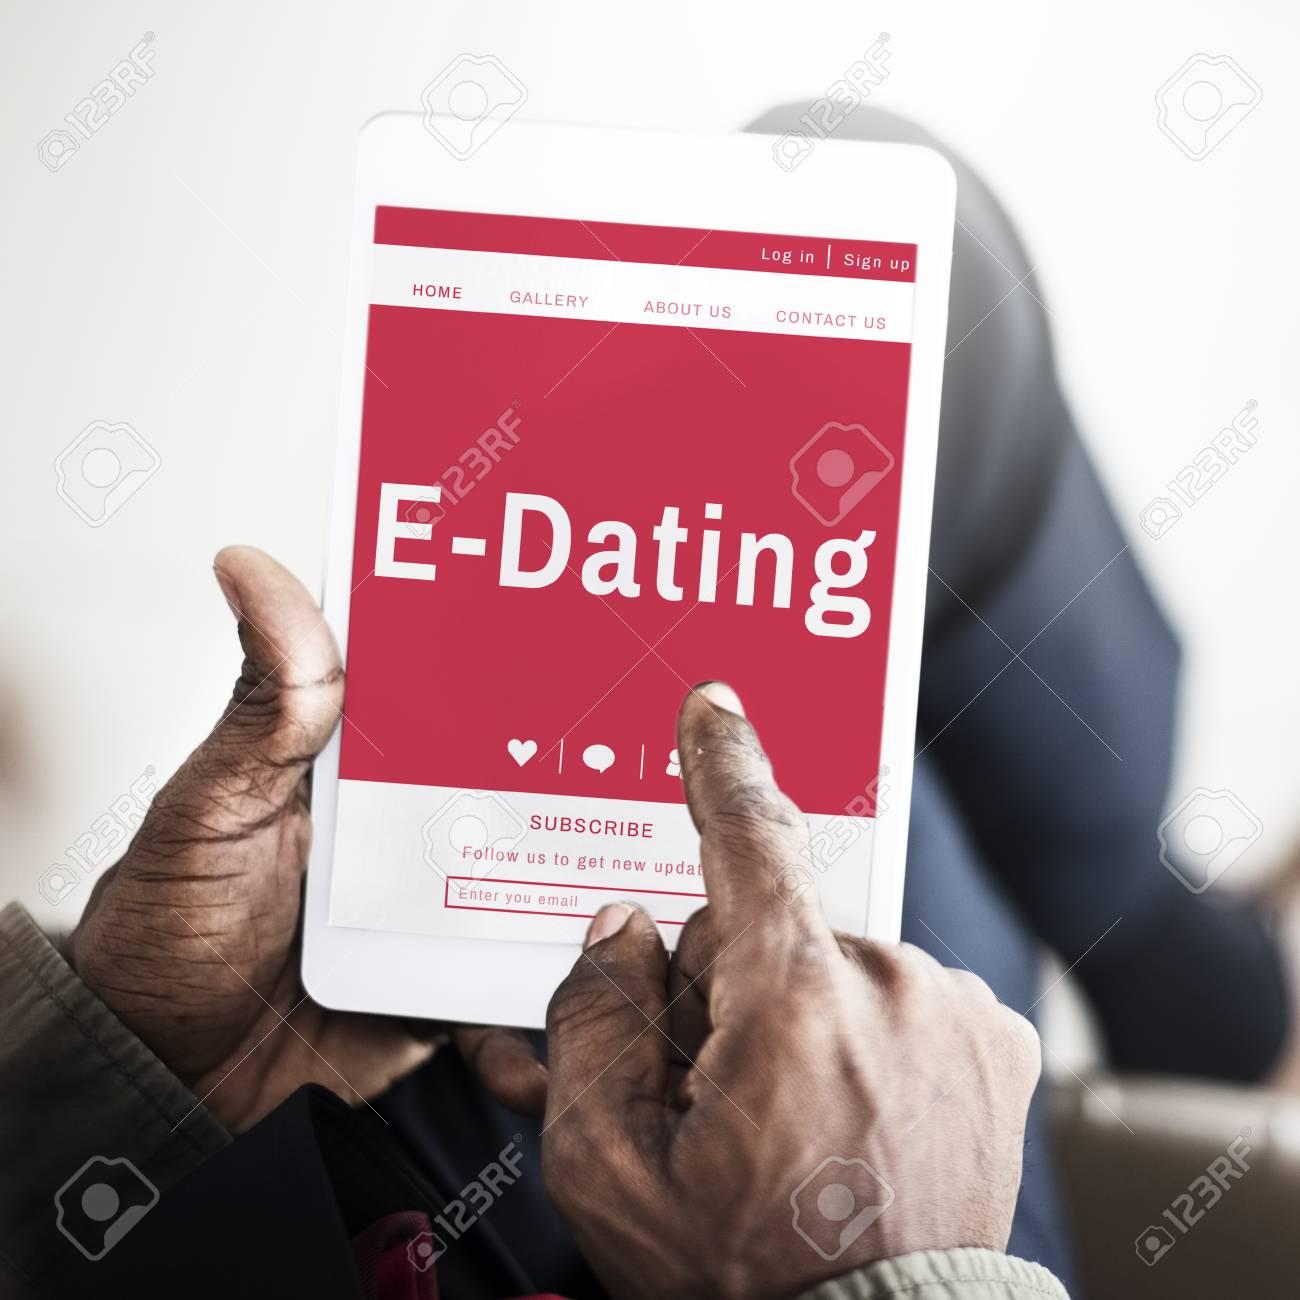 e dating login